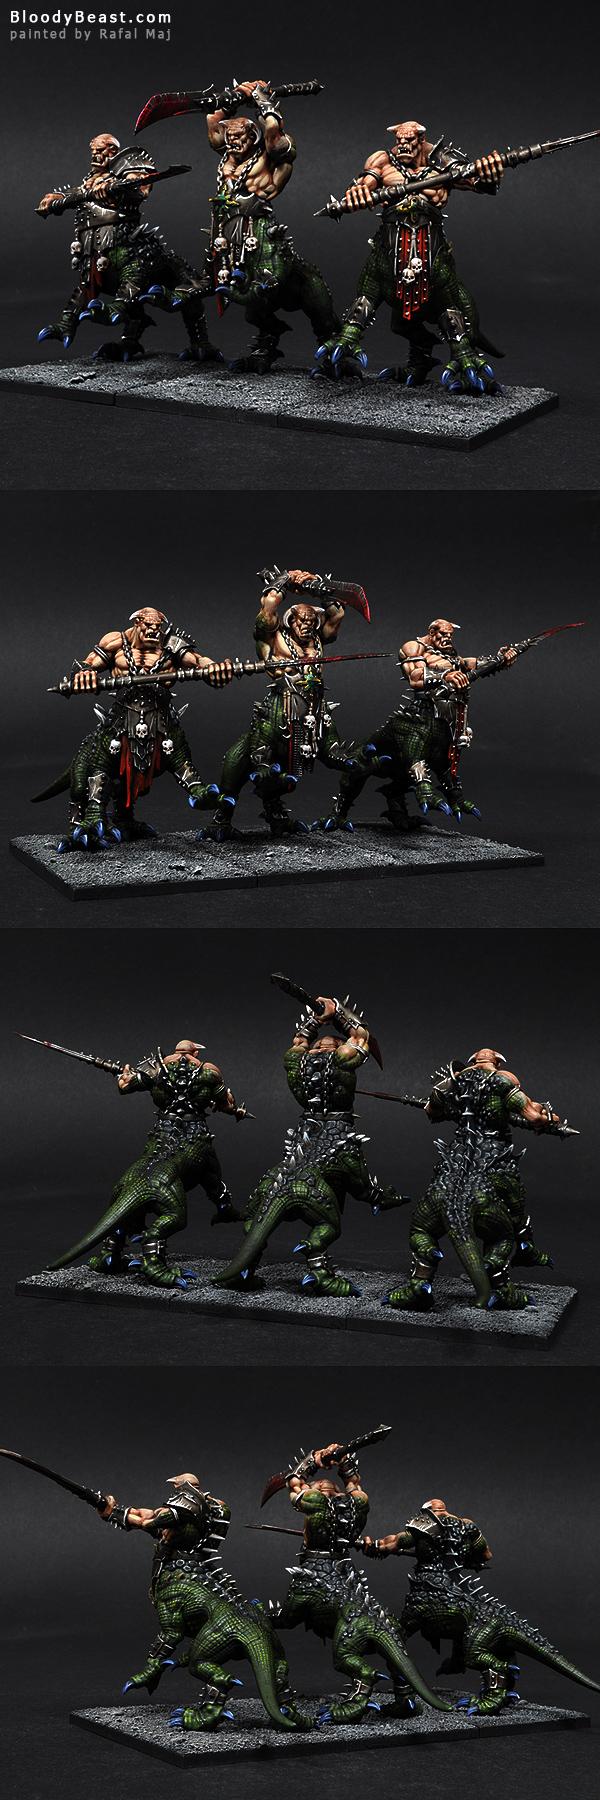 Chaos Dragon Ogres painted by Rafal Maj (BloodyBeast.com)